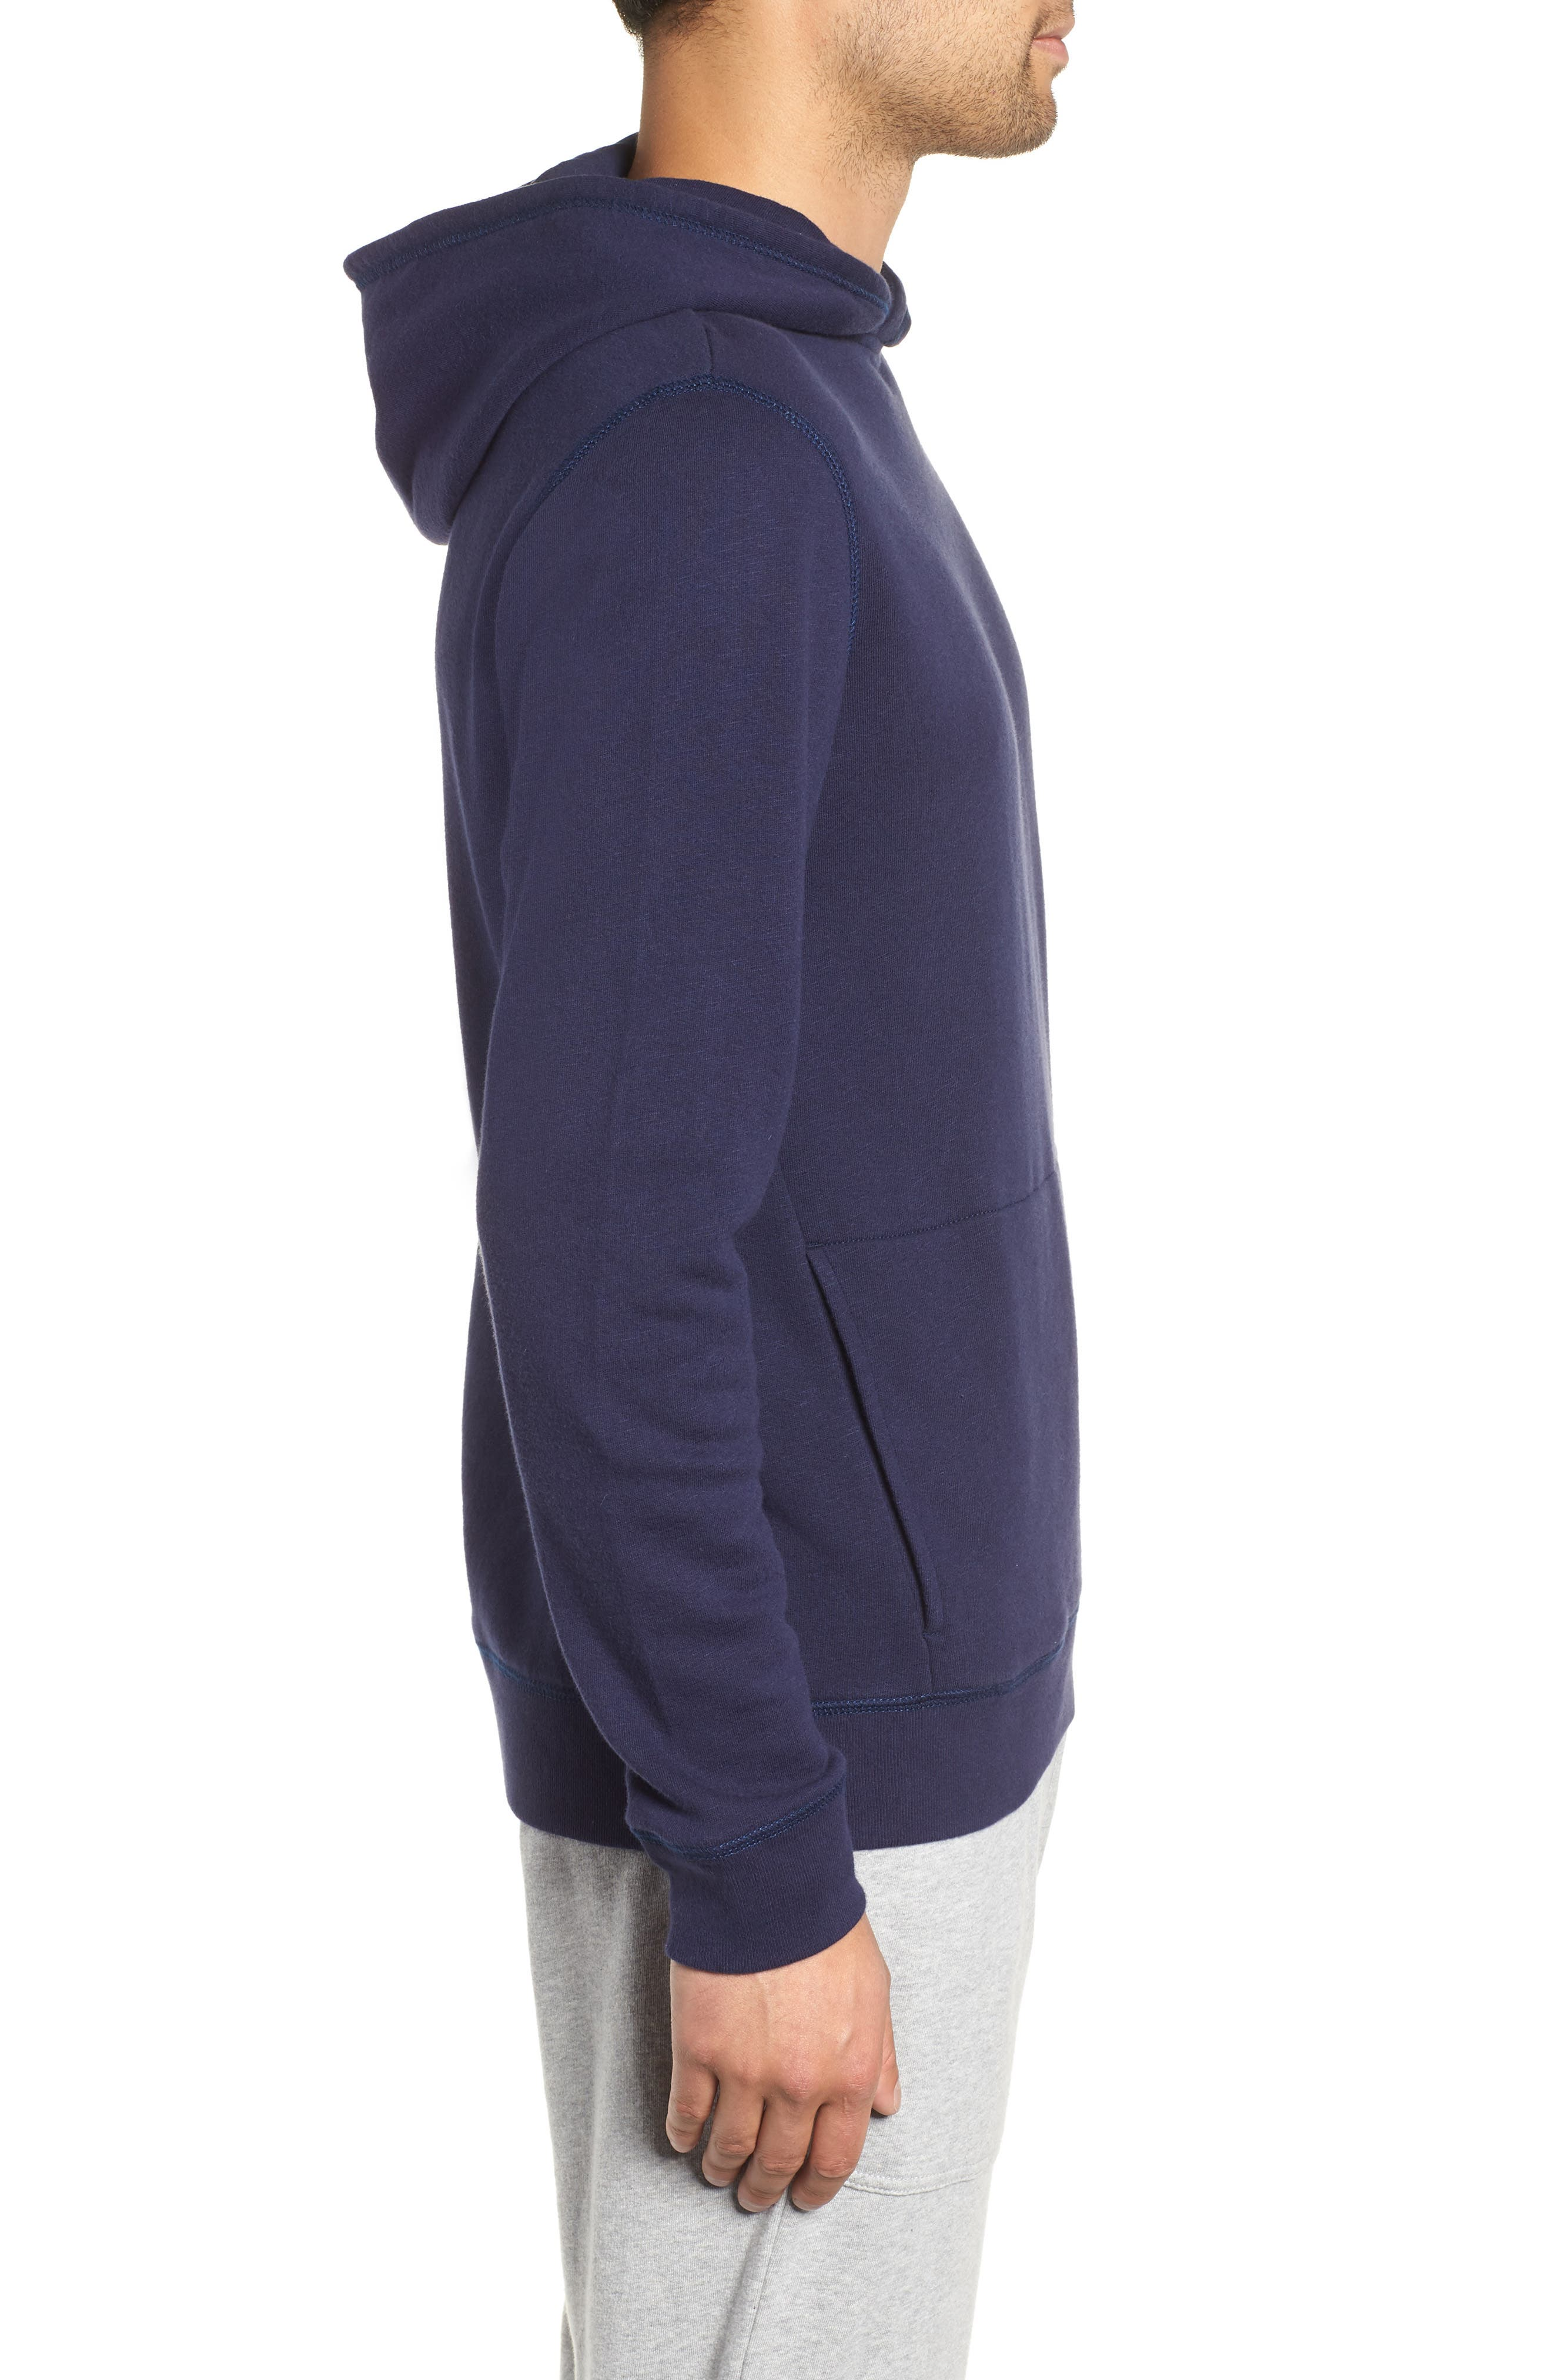 THE RAIL,                             Hooded Sweatshirt,                             Alternate thumbnail 3, color,                             410